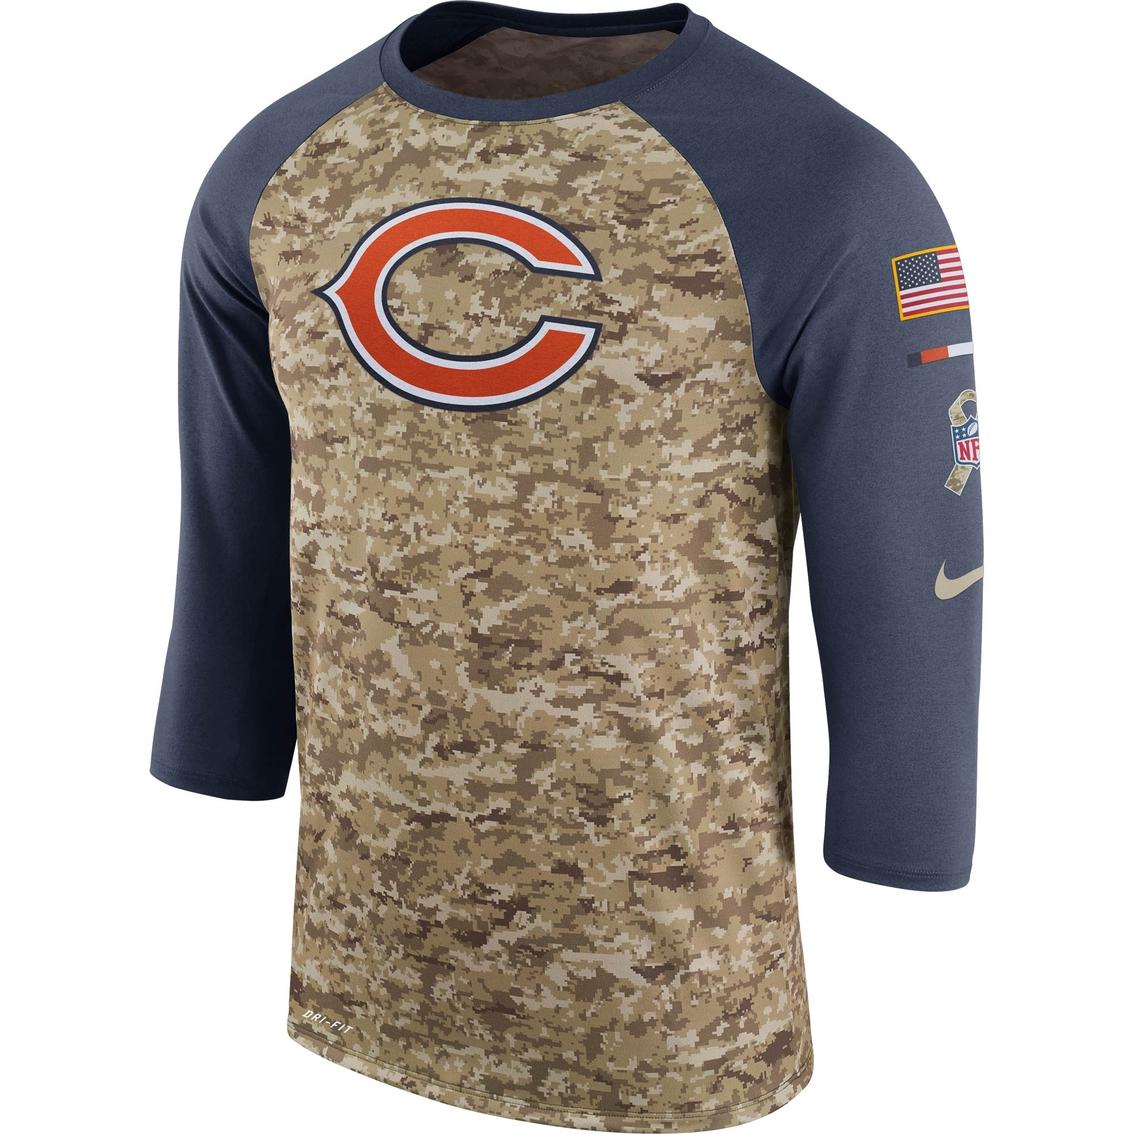 Nike Nfl Chicago Bears Salute To Service Raglan Tee  6d05285dd